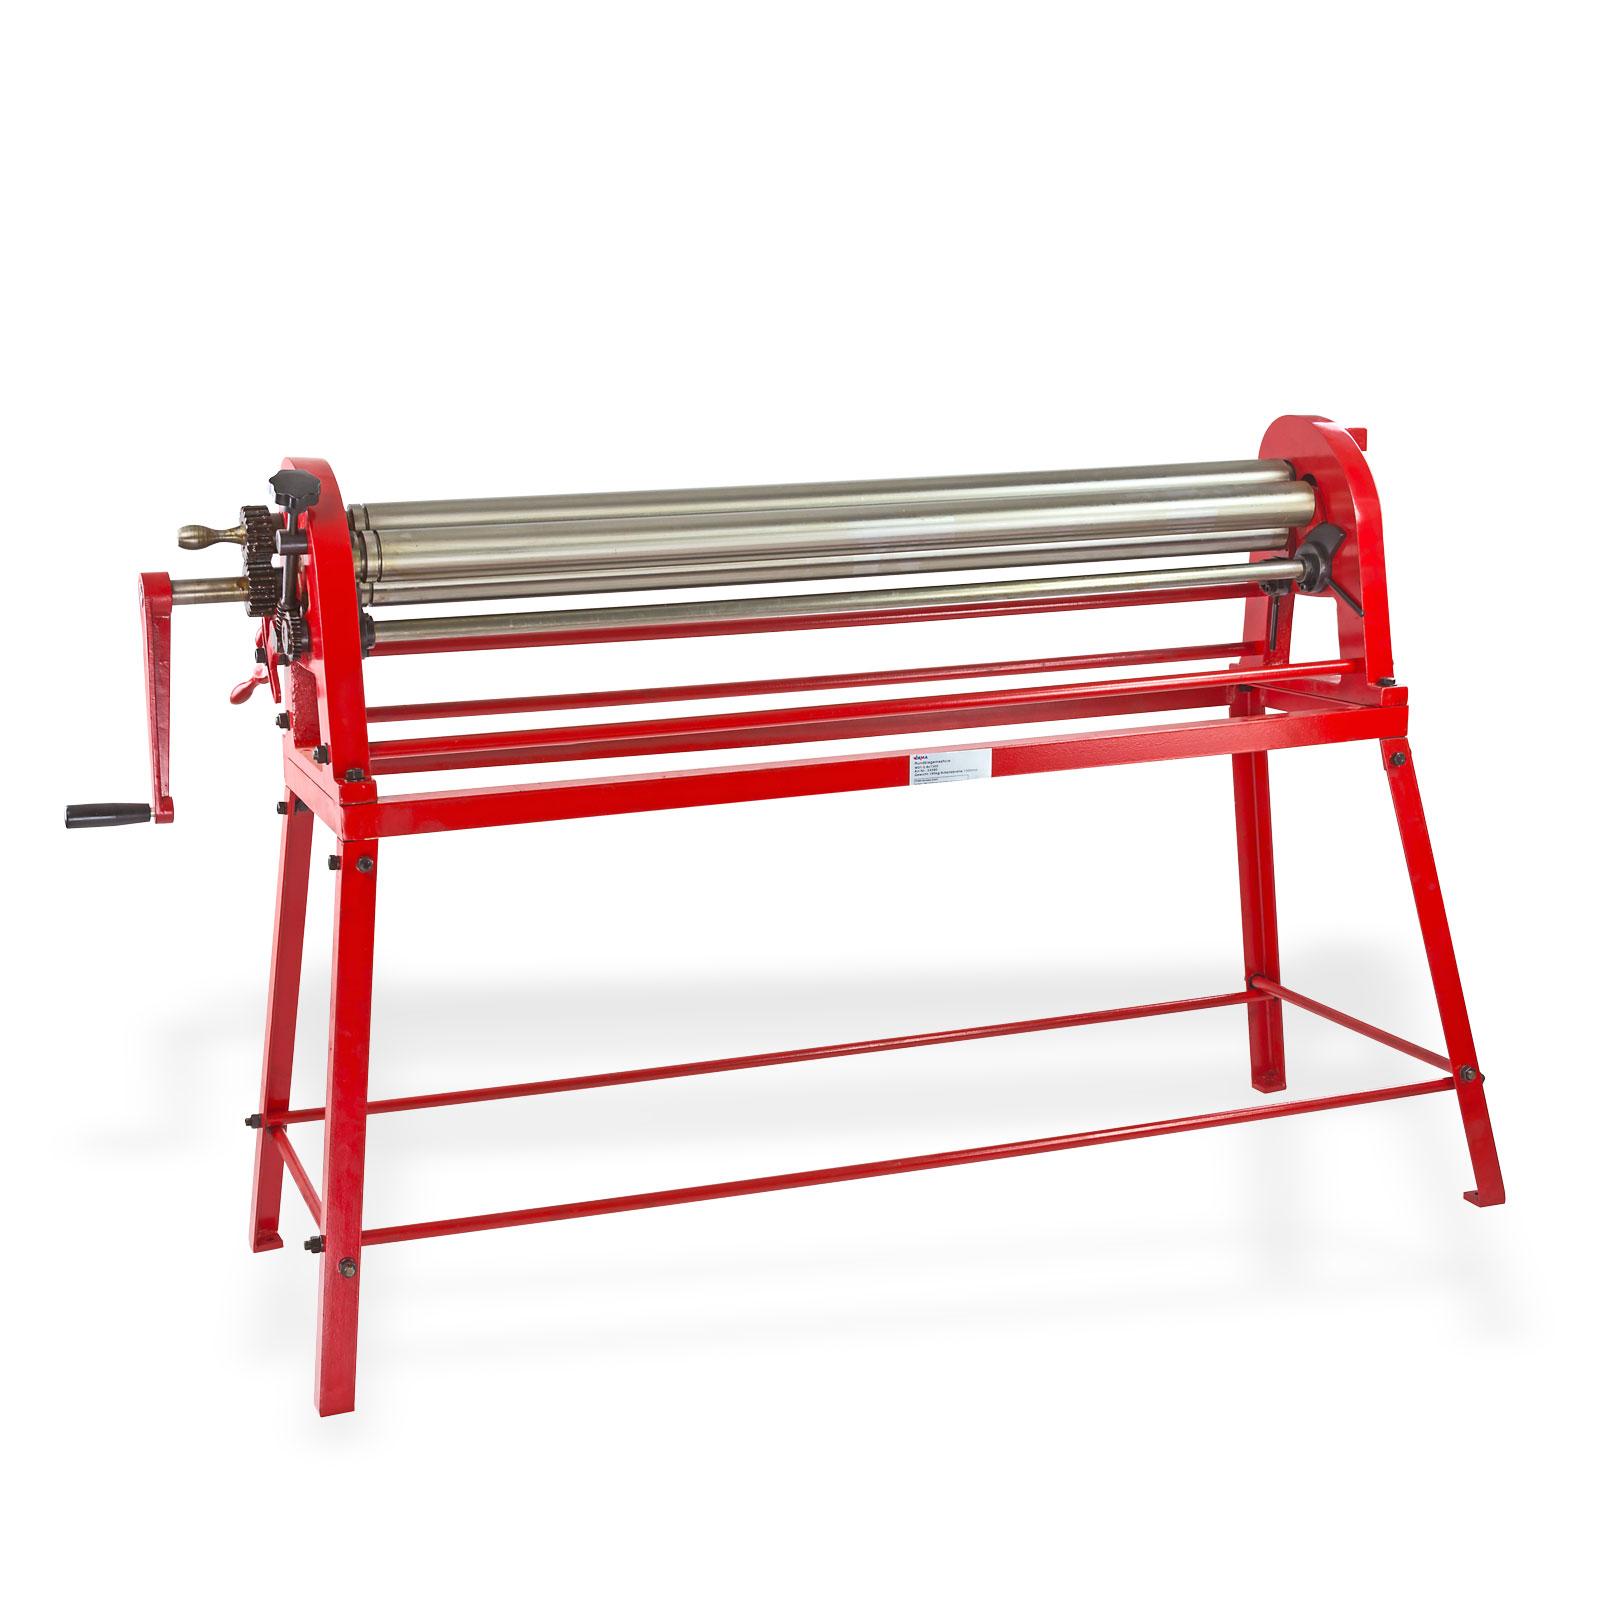 Dema Rundbiegemaschine / Rollenbiegemaschine W01-0,8x1300 mm 24390